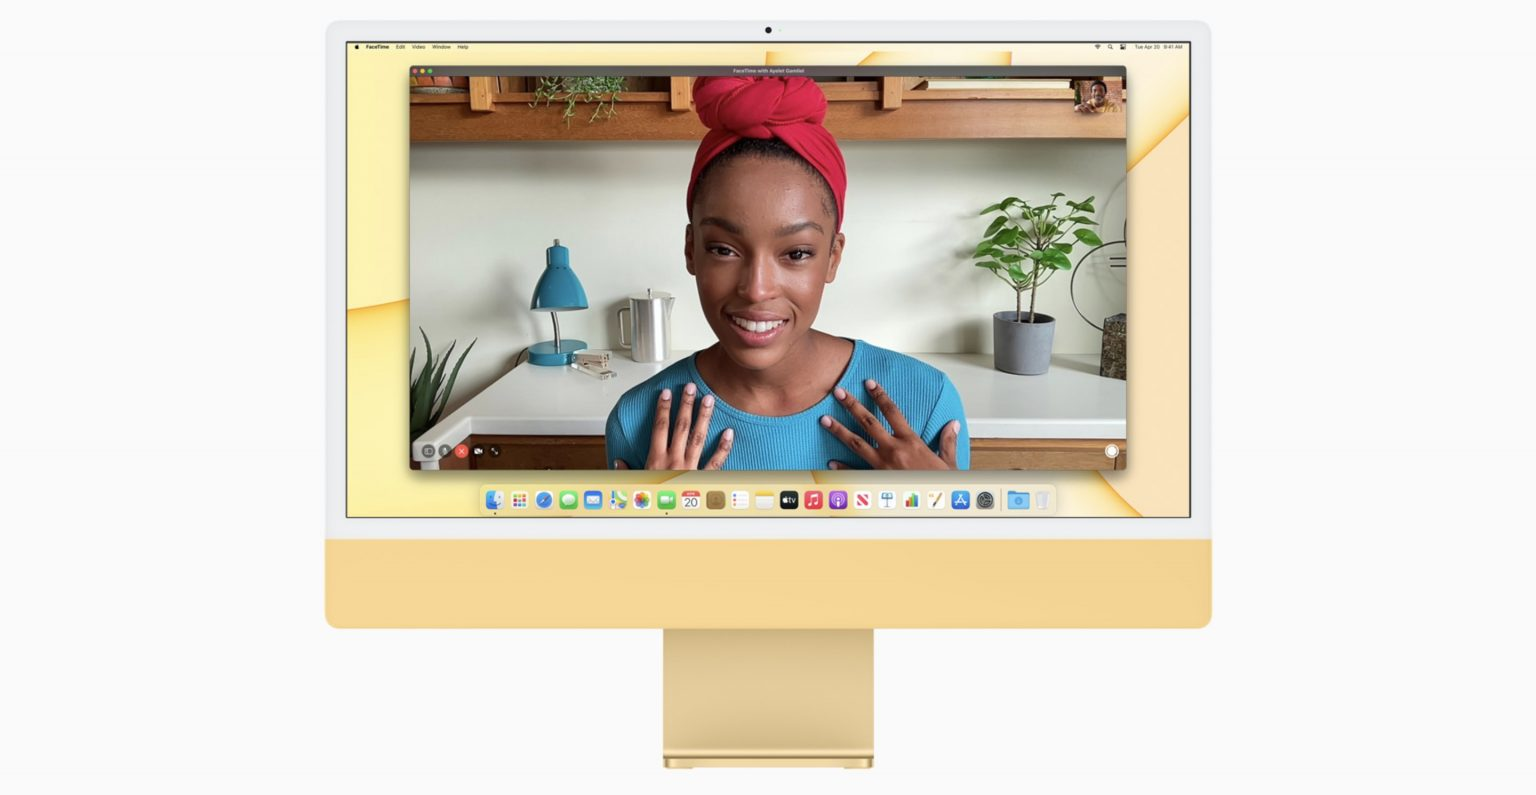 M1 iMac with 1080p camera